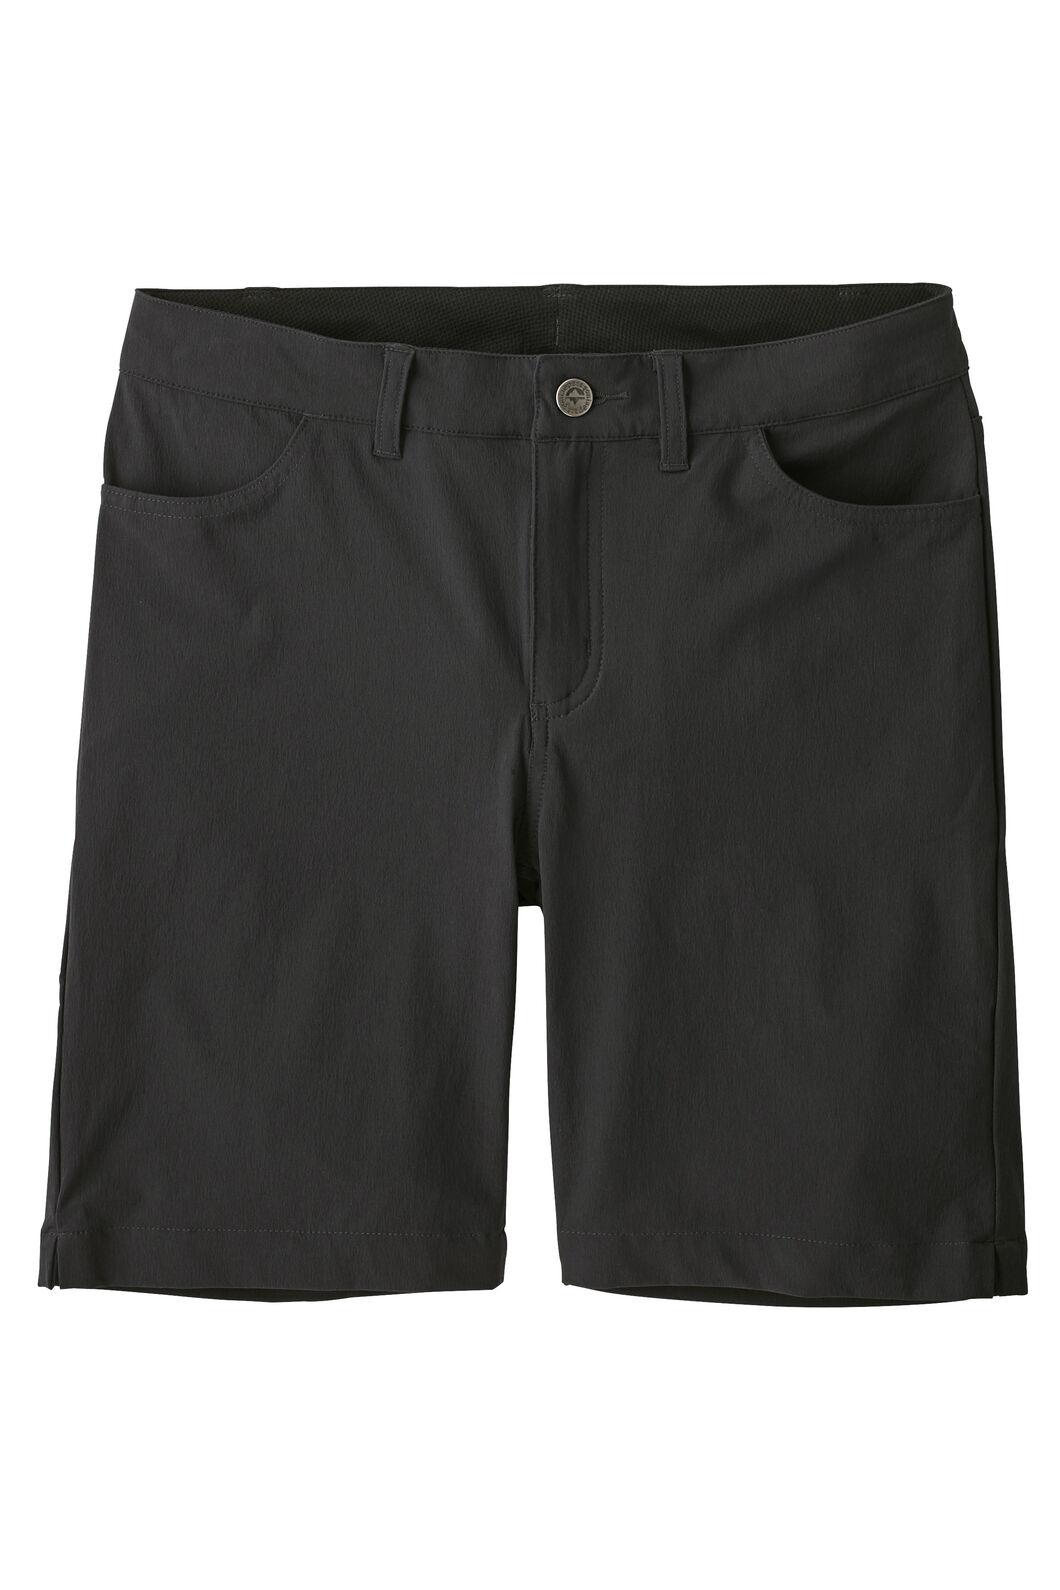 Patagonia Skyline Traveller Shorts — Women's, Black, hi-res